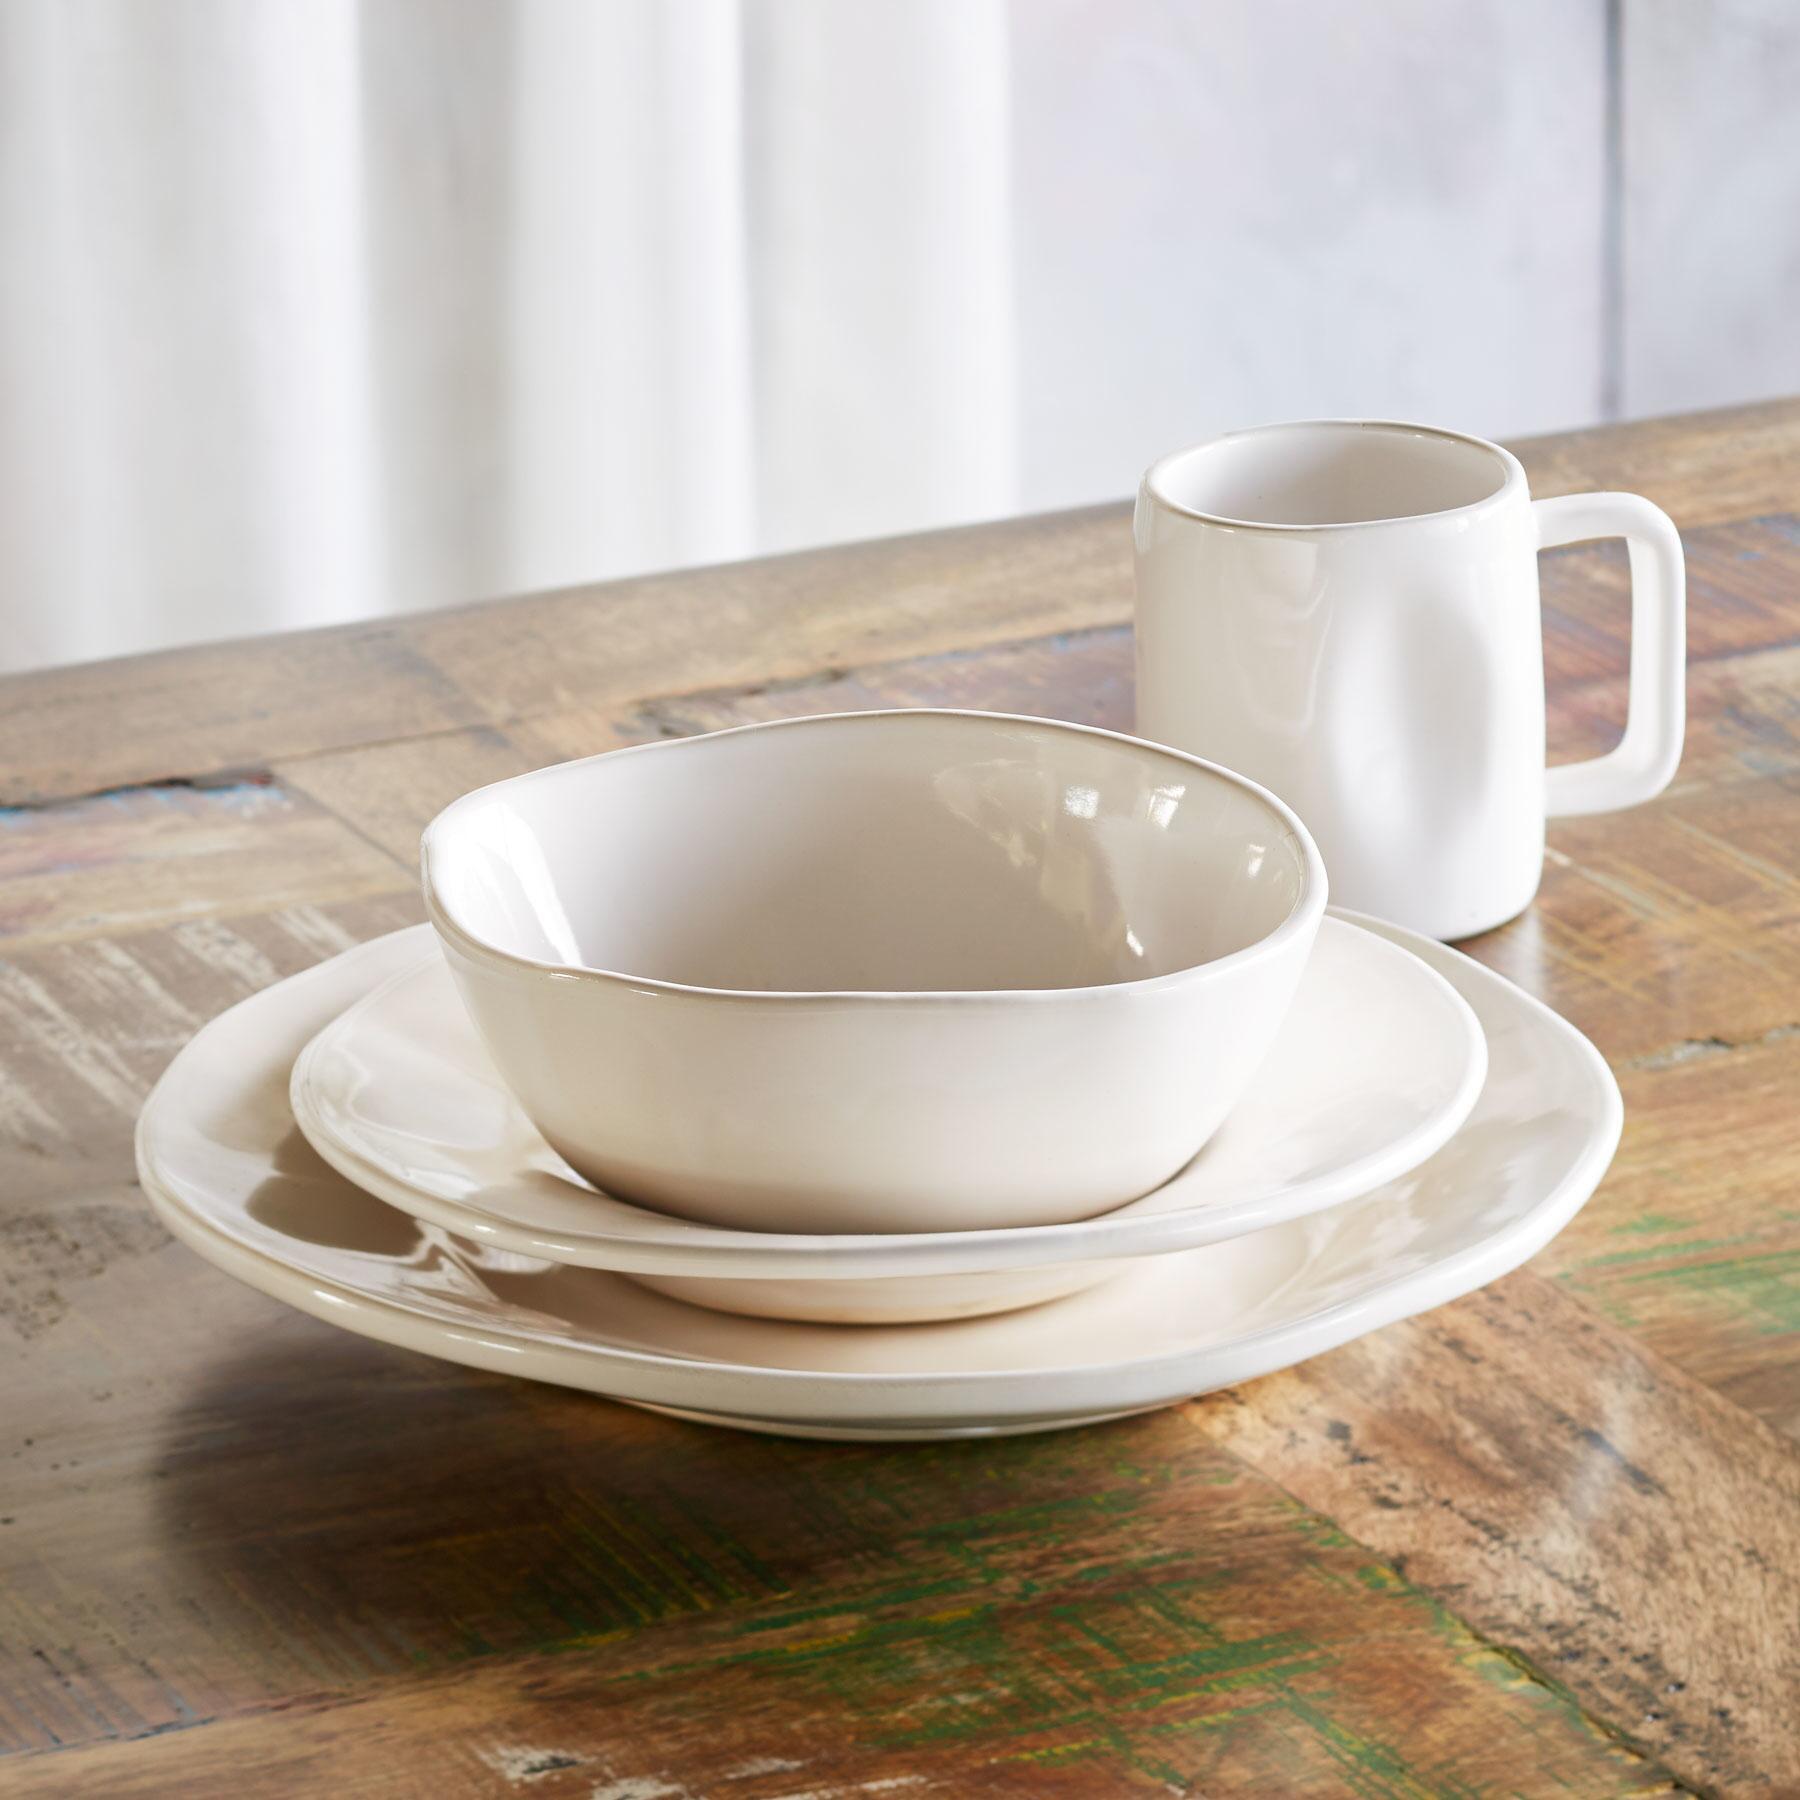 ALEX MARSHALL ORGANIC DINNERWARE, 4-PIECE PLACE SETTING: View 1